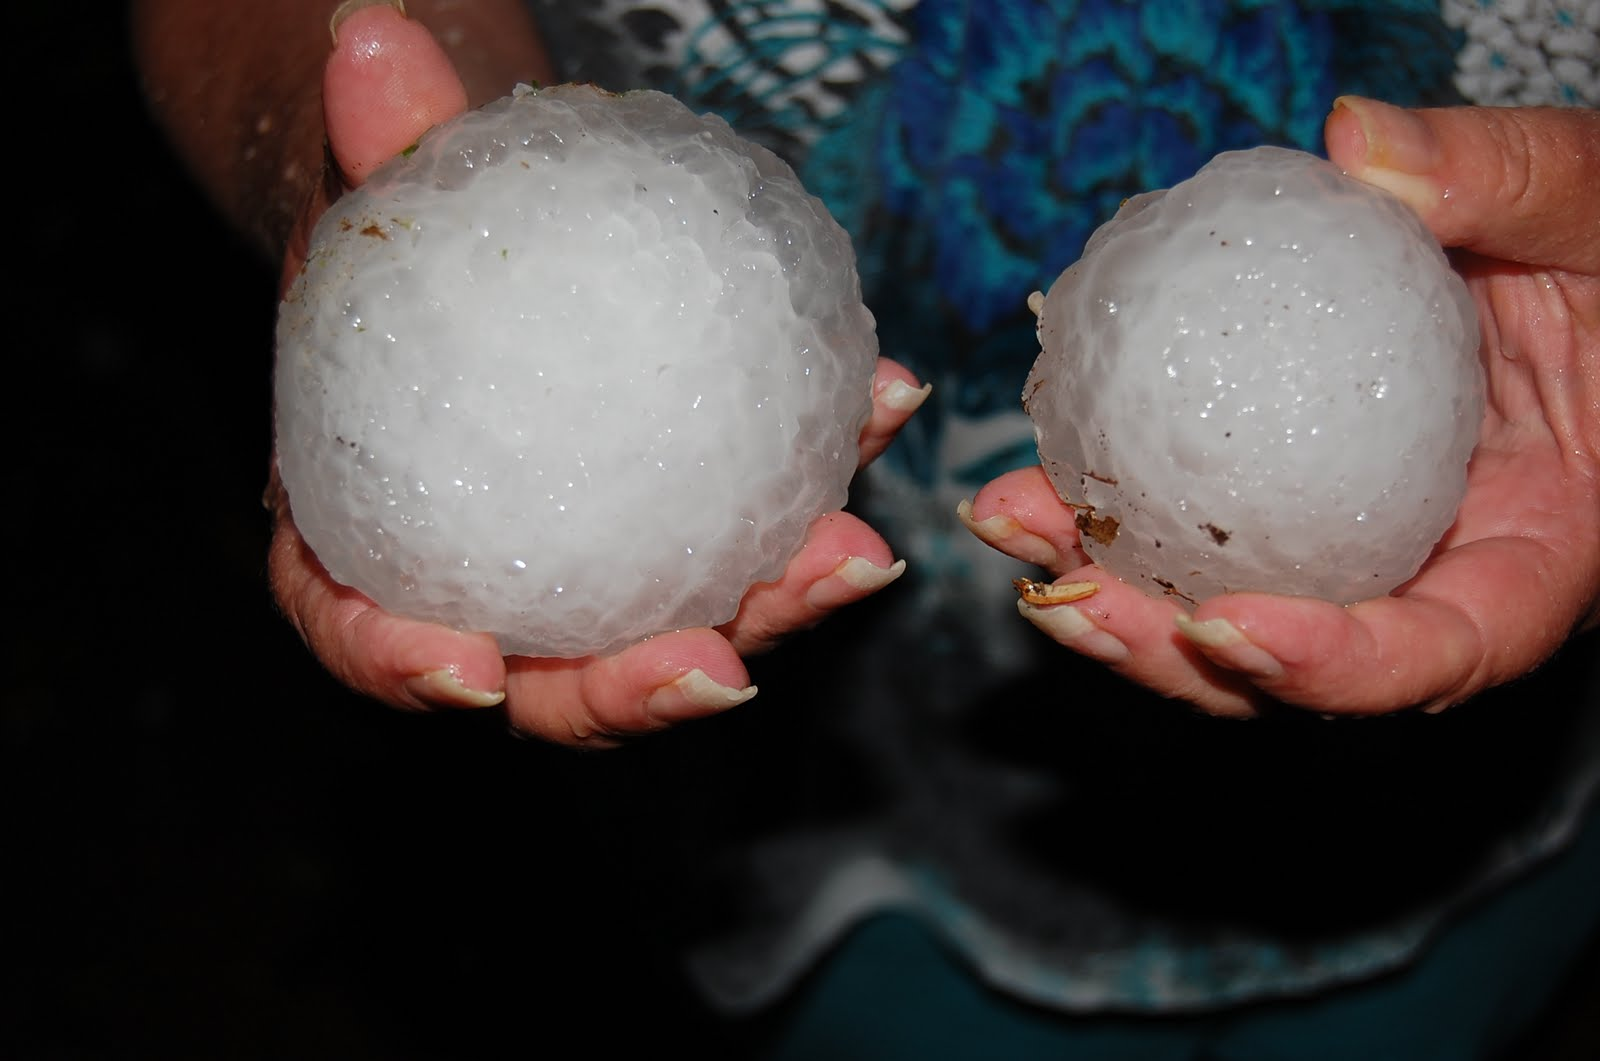 Softball Sized Hail - YouTube